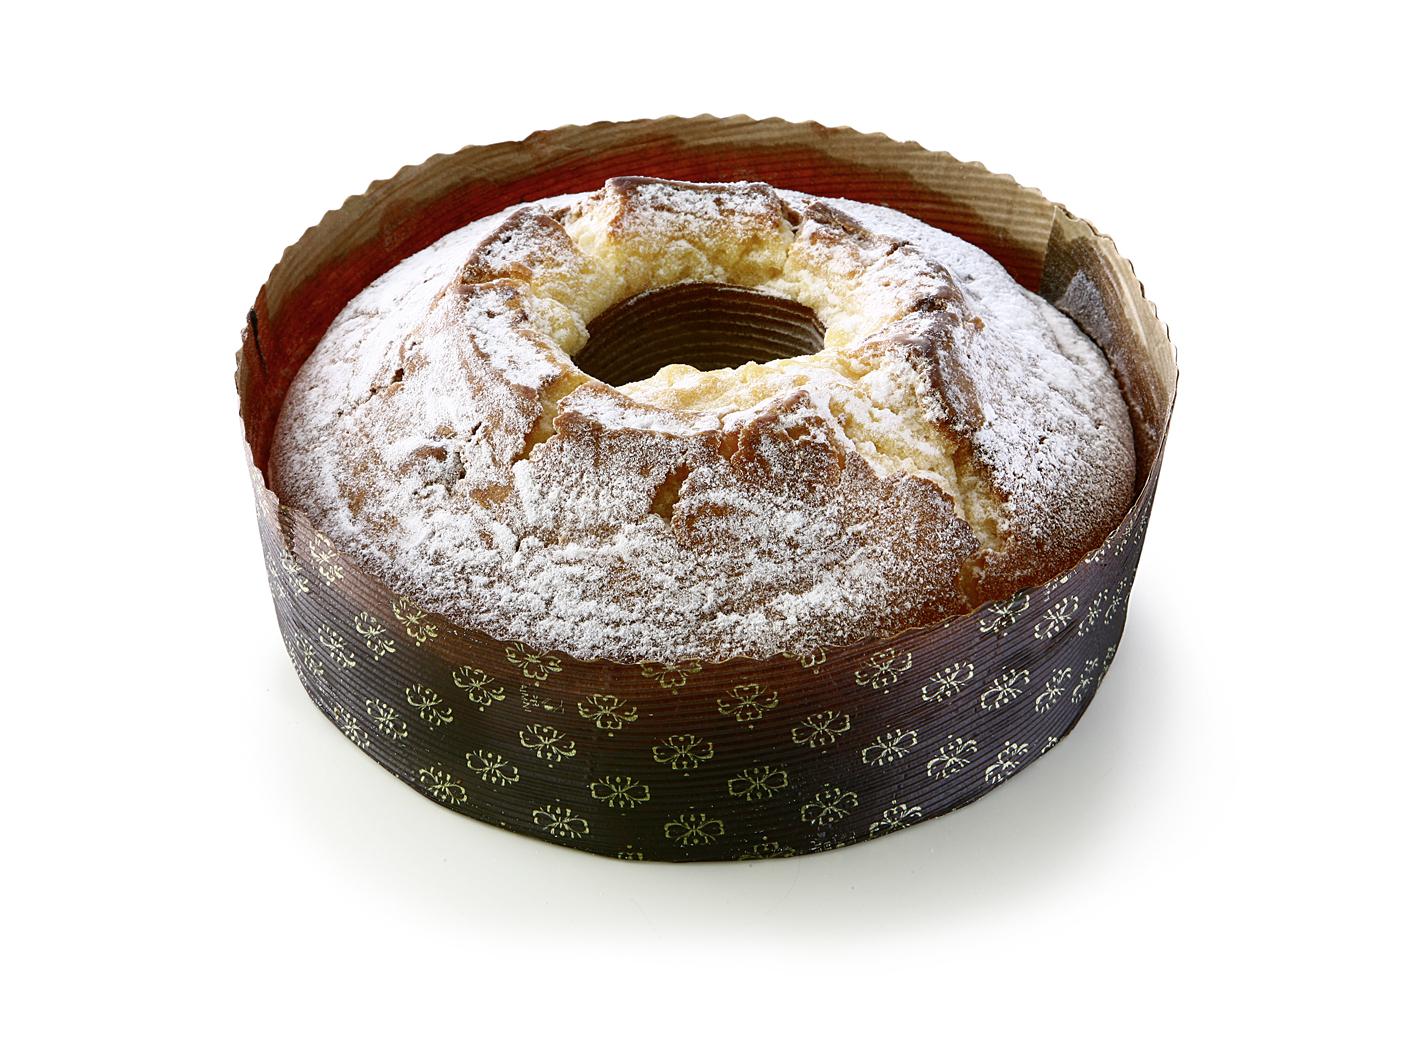 Marble Cake - Light and dark pound cake. Diameter: 20cm